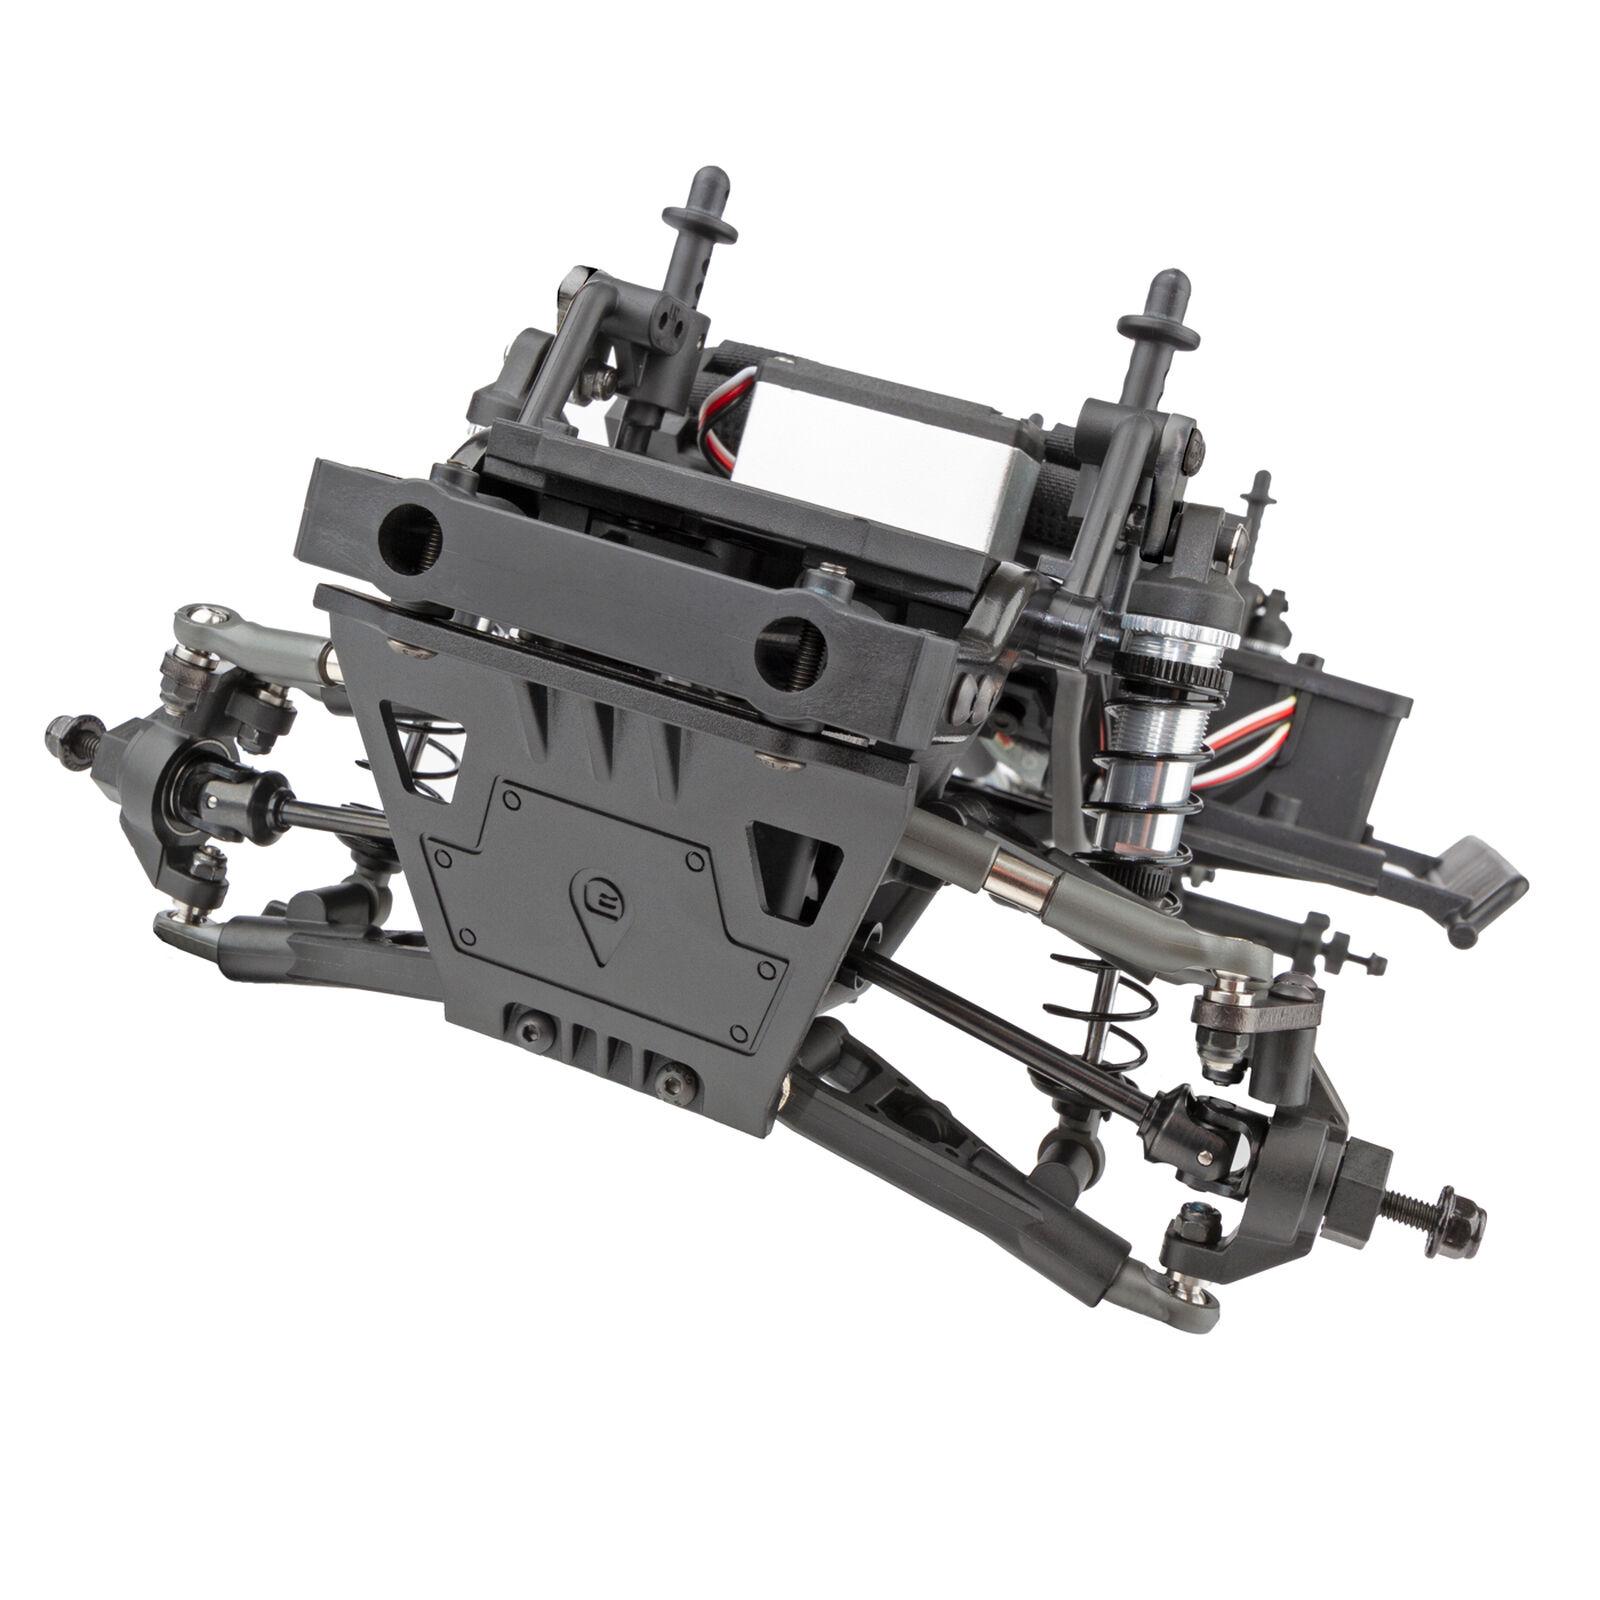 1/10 Enduro Trailrunner 4WD Rock Crawler RTR LiPo Combo